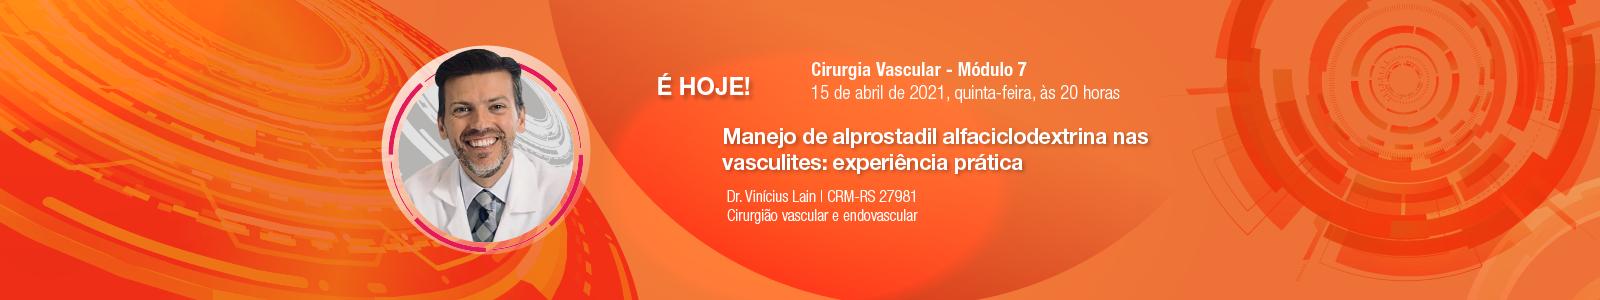 Visão Aché2021-banners vascular-1 2